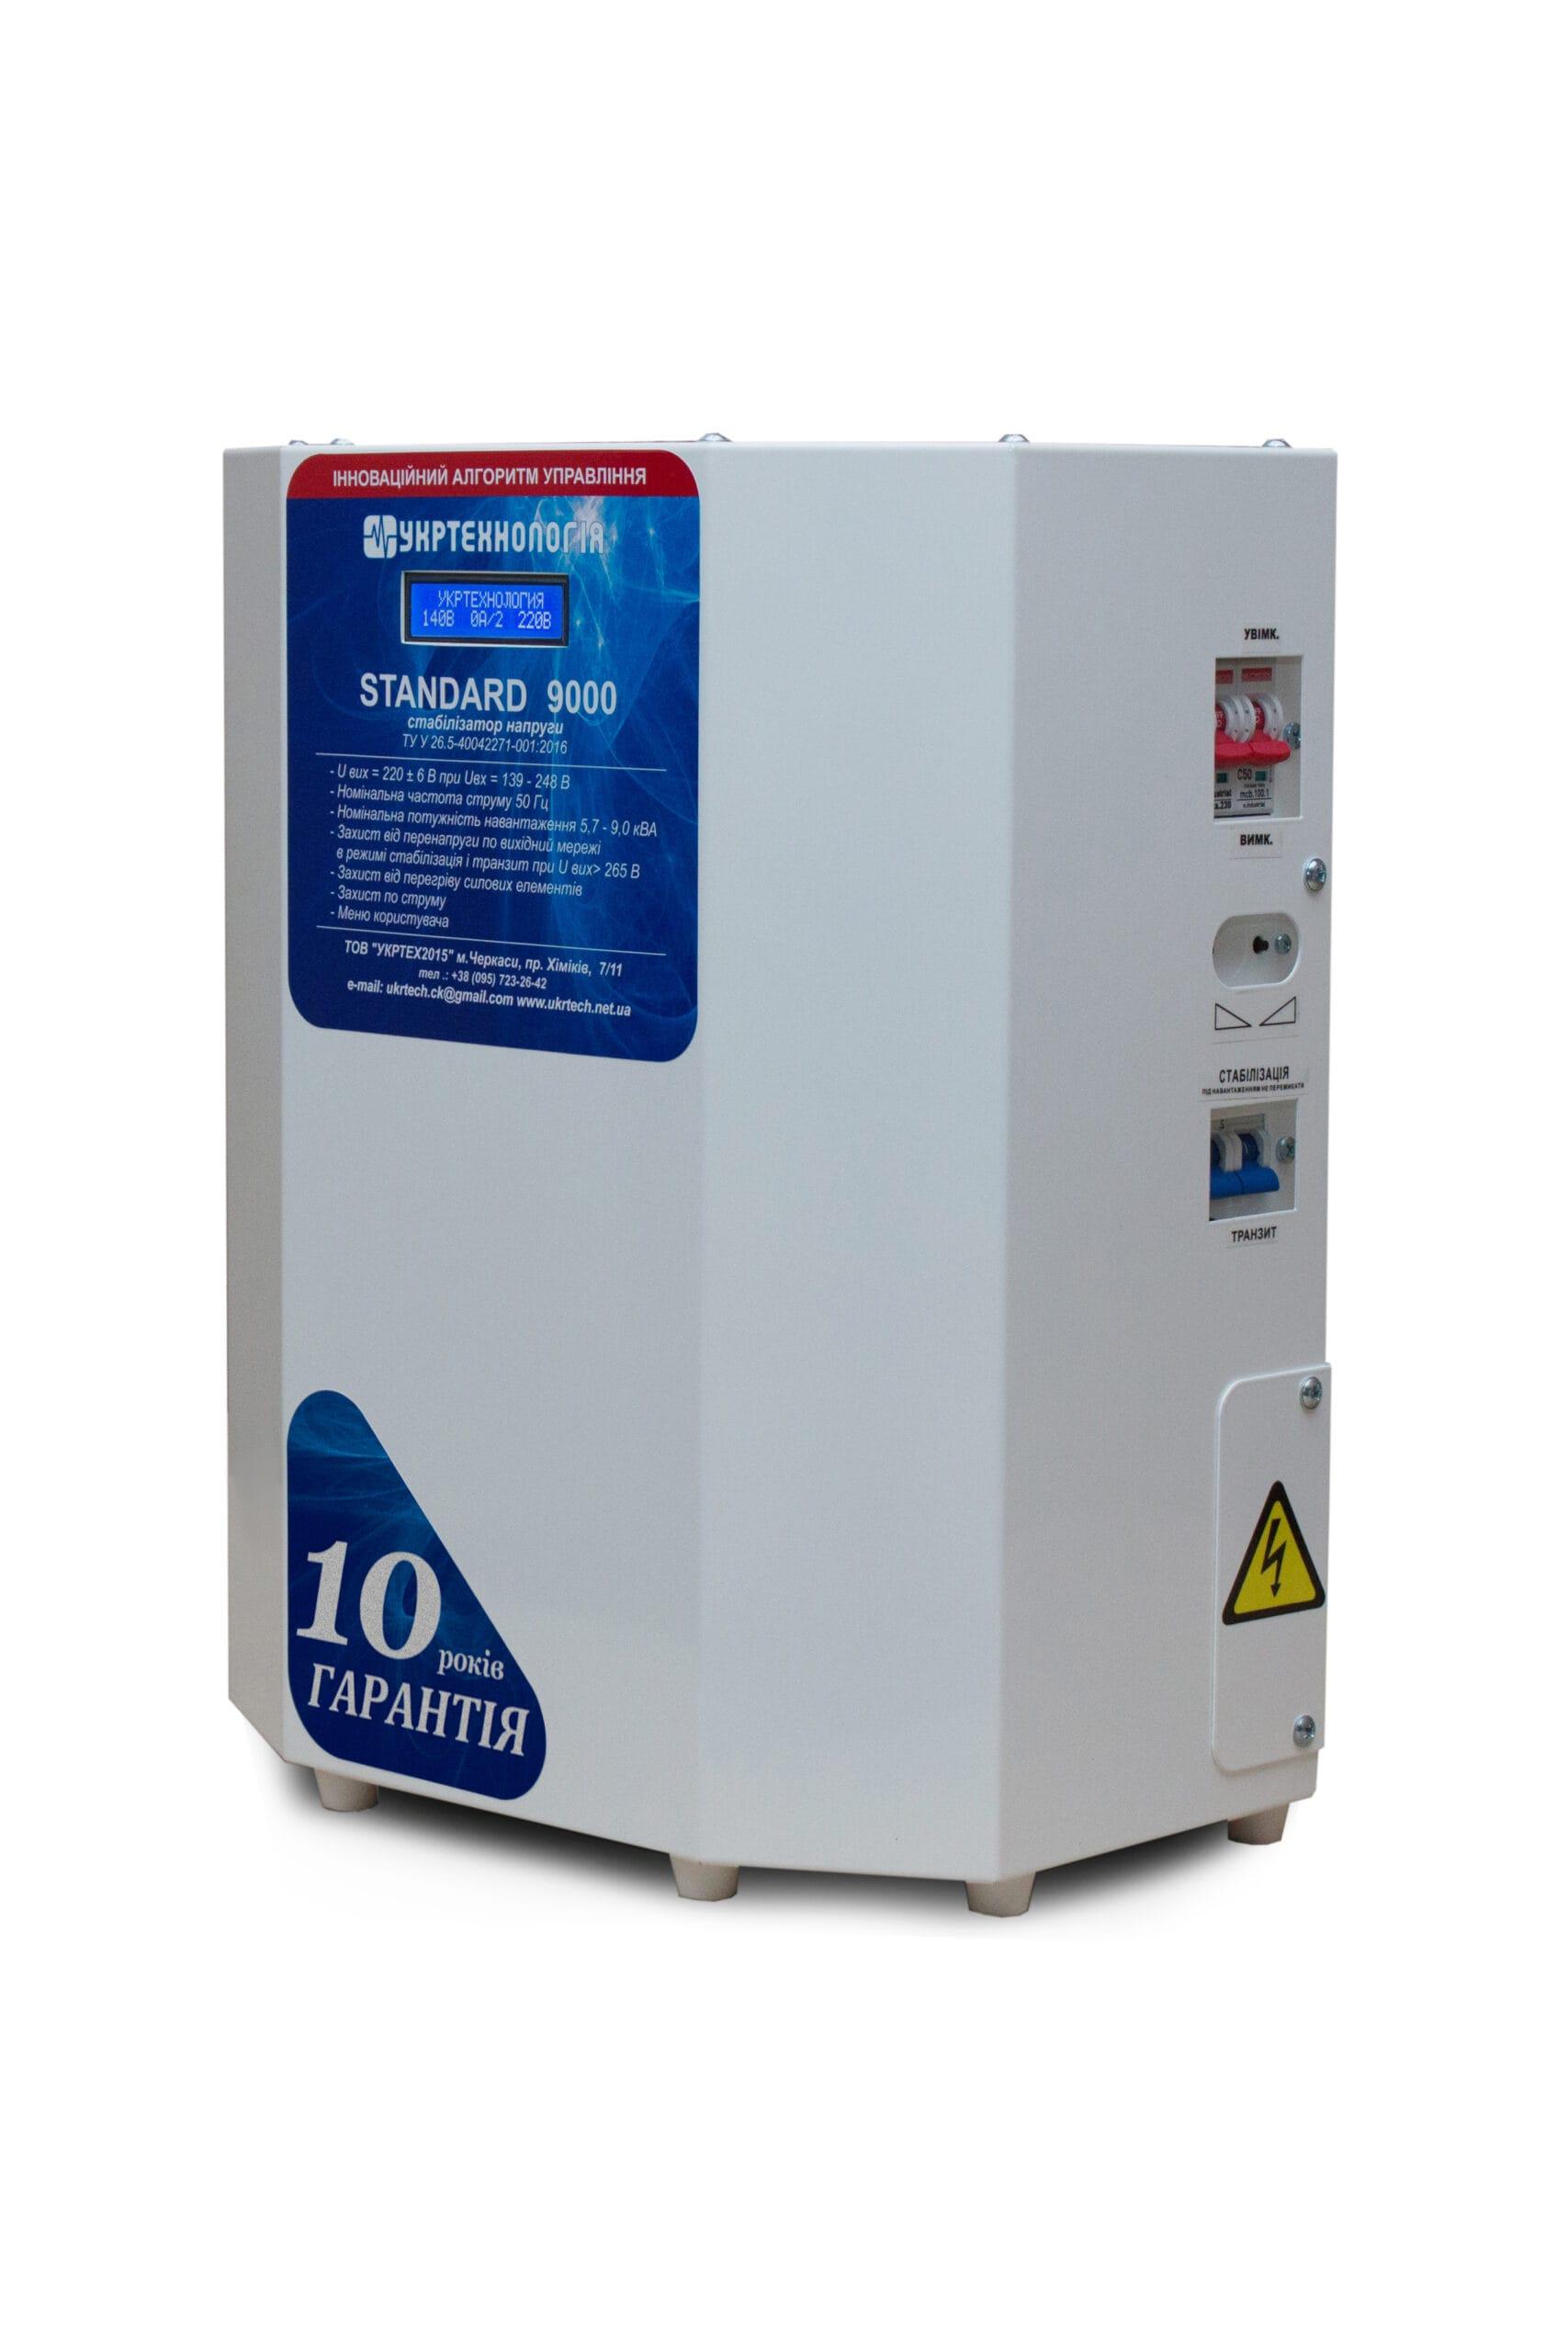 Стабилизаторы напряжения - Стабилизатор напряжения 9 кВт STANDARD 000001398 - Фото 1